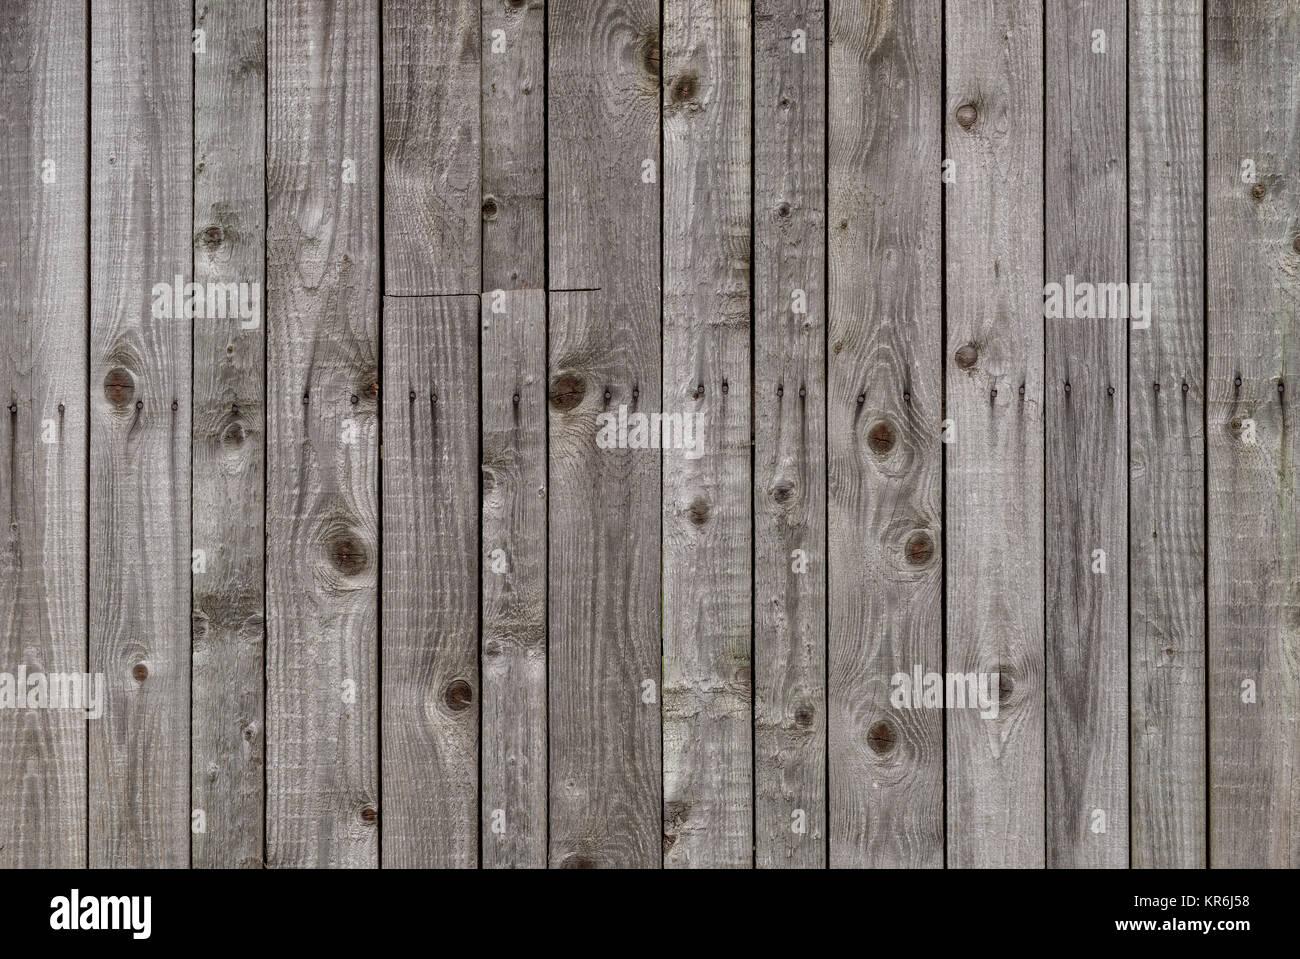 greying wood wall - Stock Image